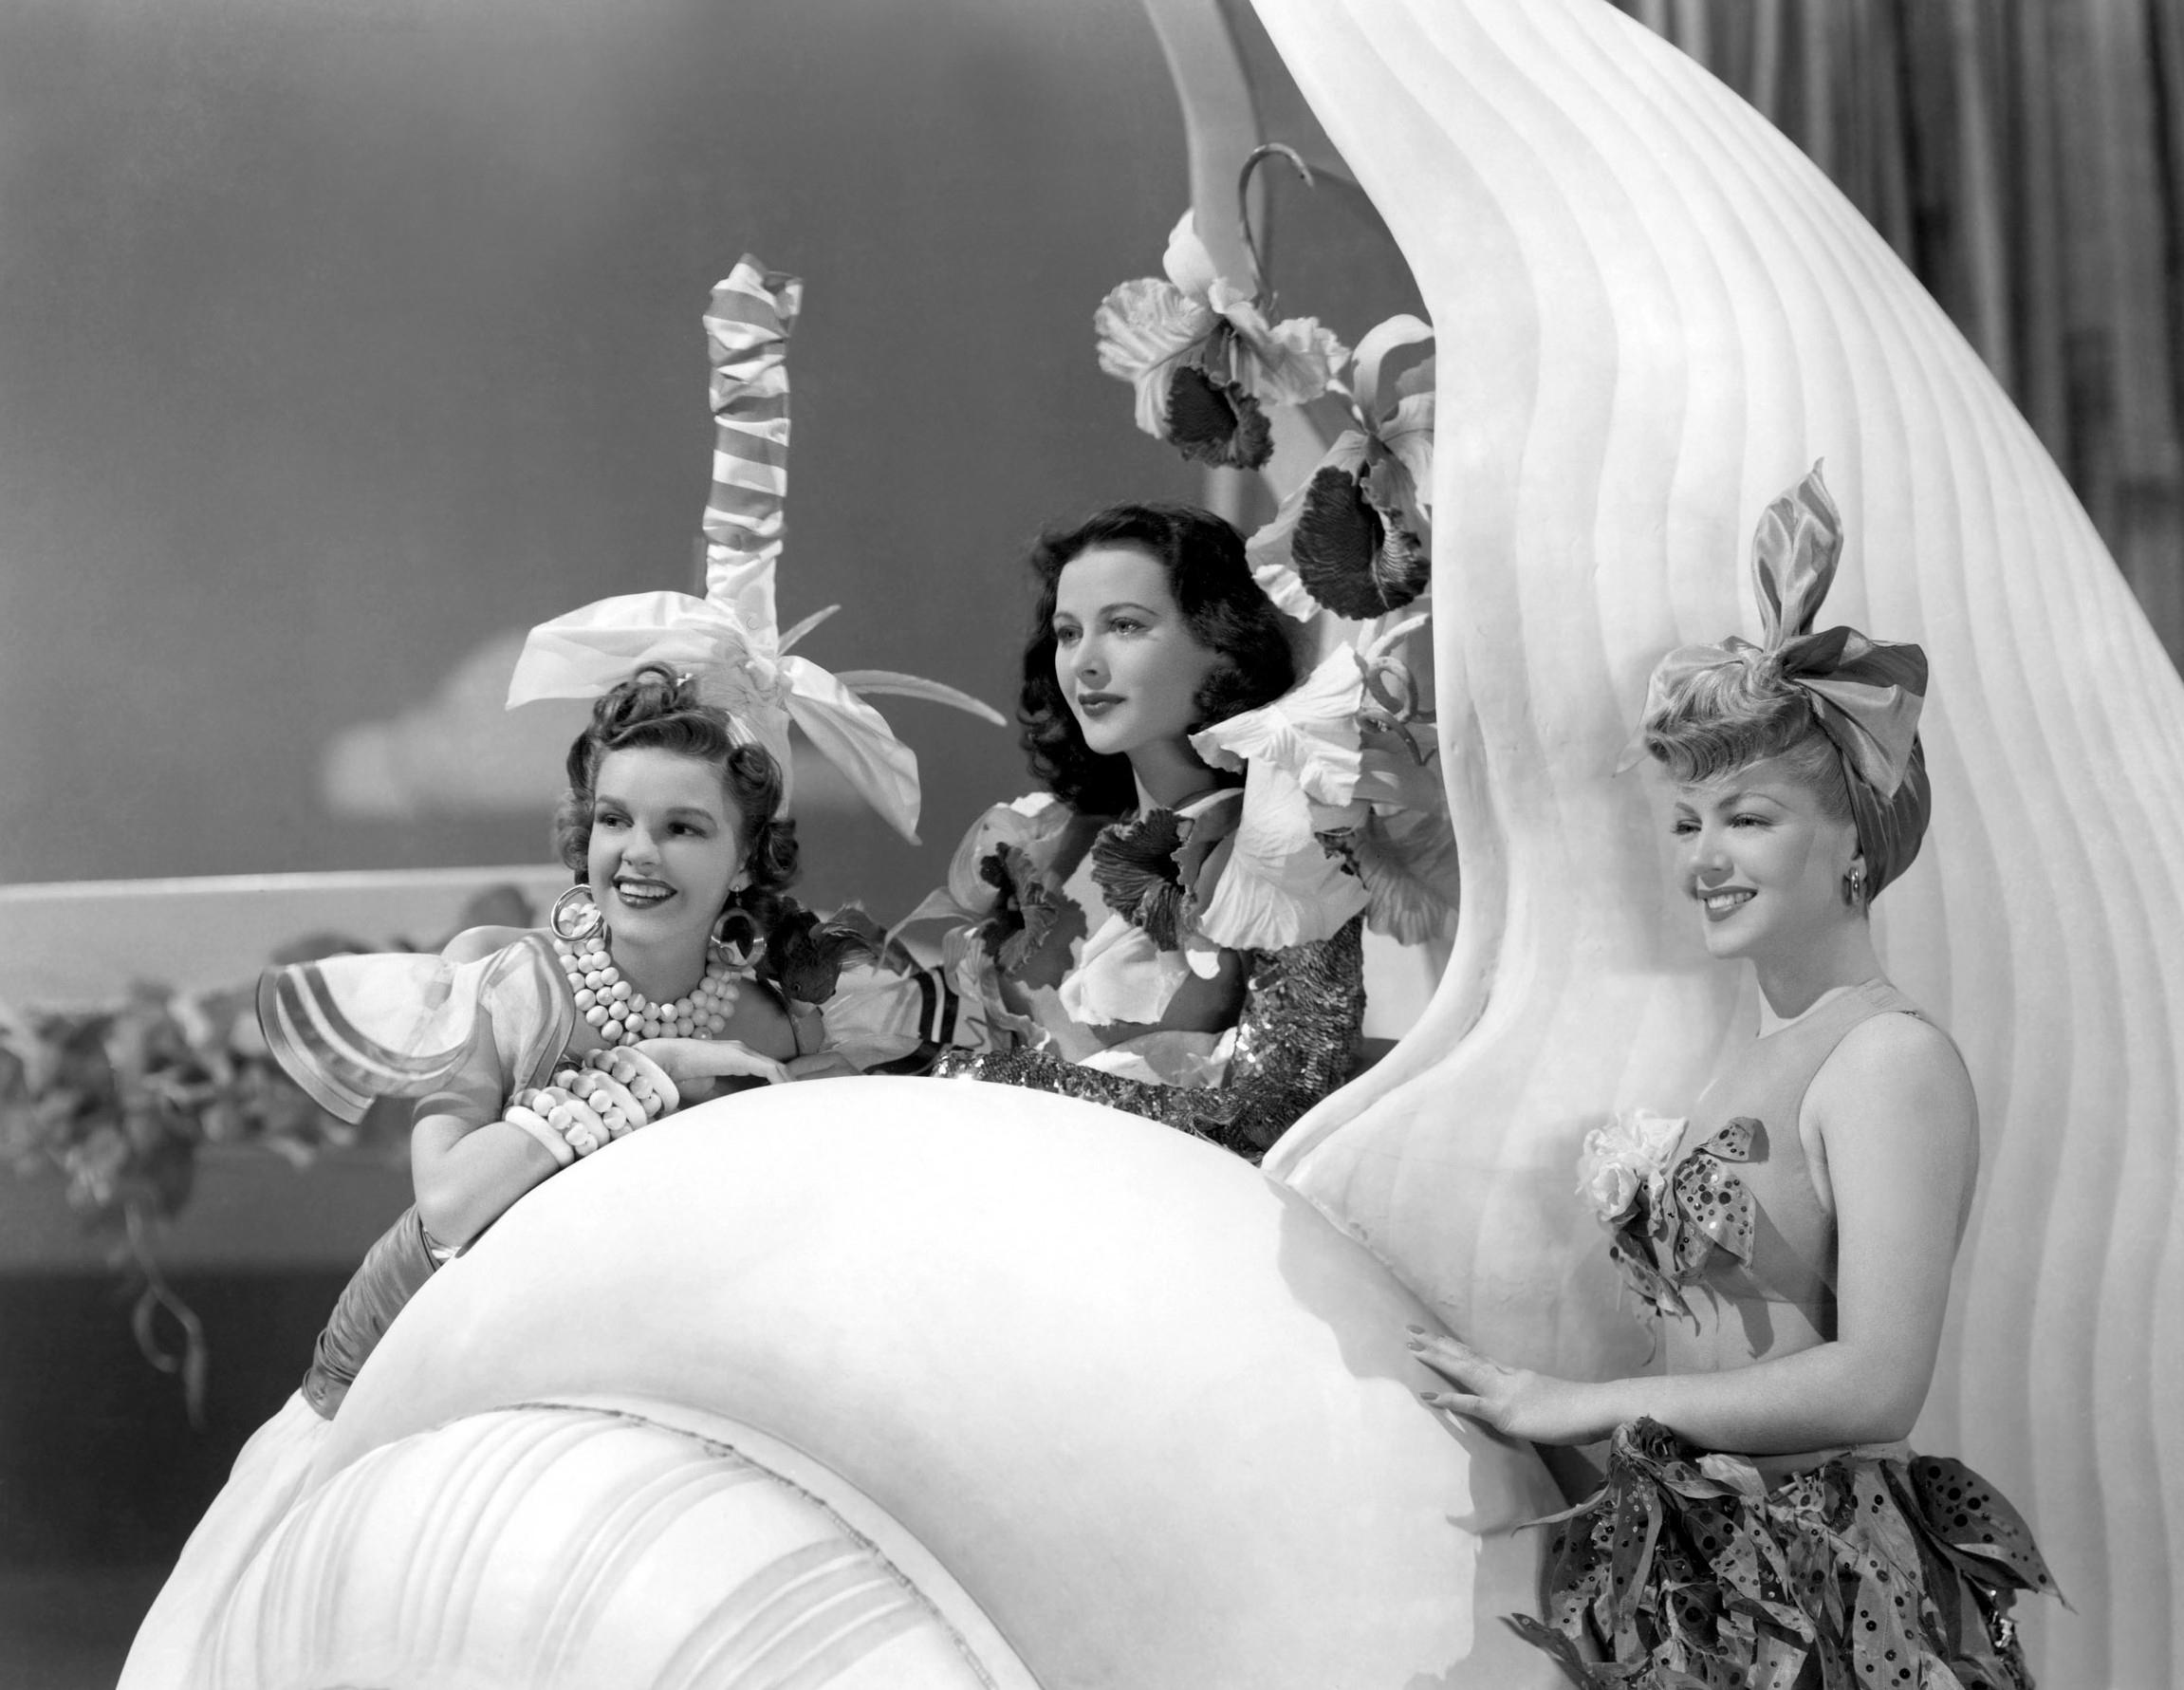 (L to R)  Judy Garland, Hedy Lamarr, Lana Turner.